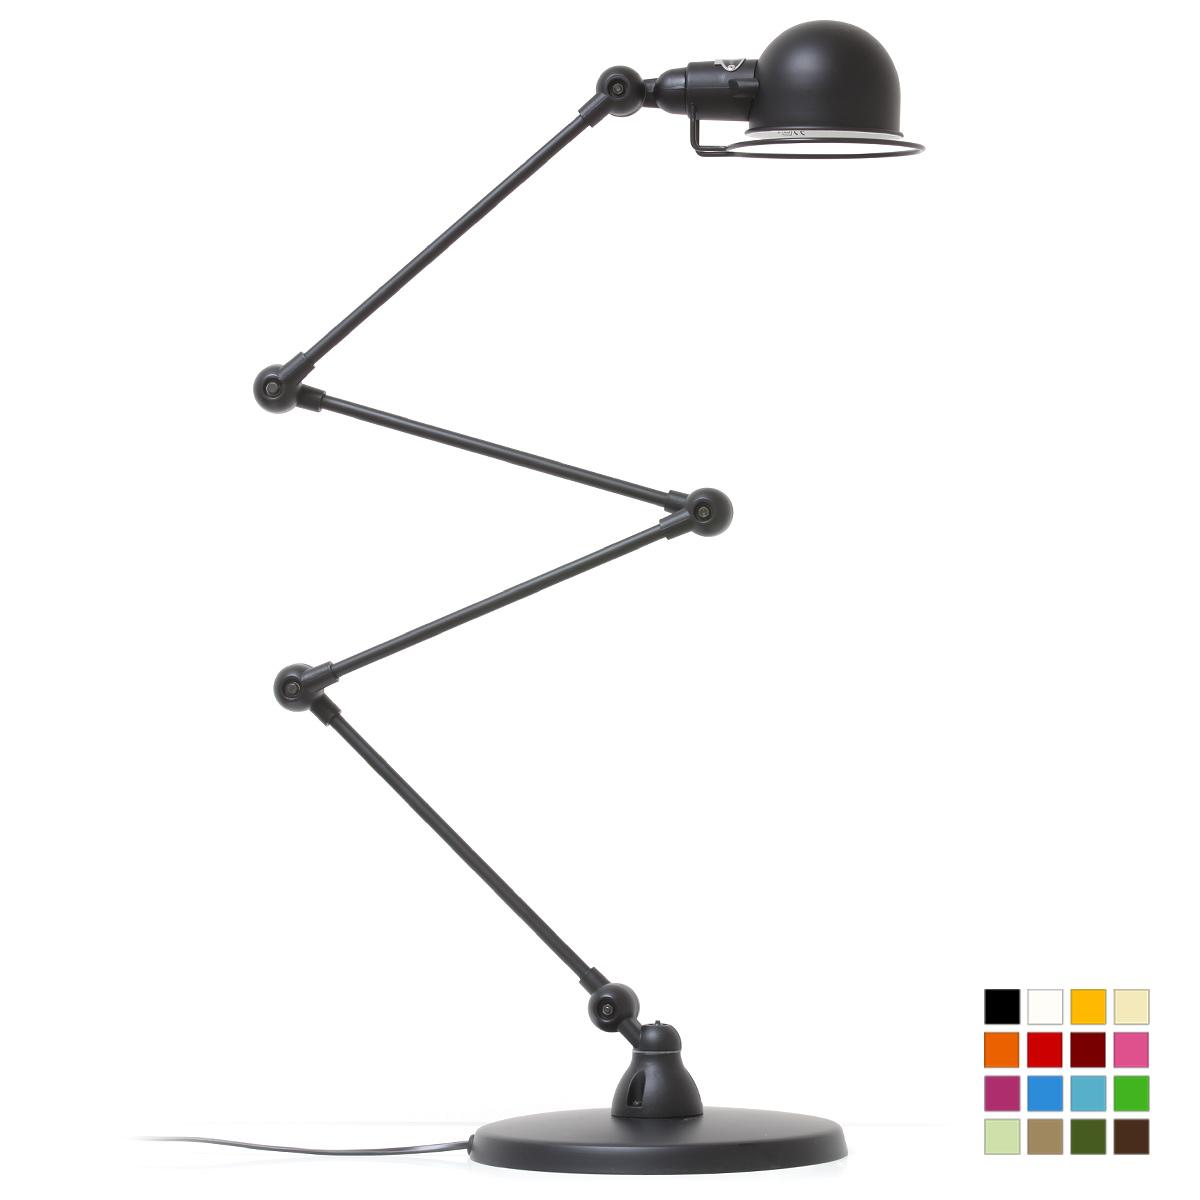 zick zack gelenk stehlampe signal si433 casa lumi. Black Bedroom Furniture Sets. Home Design Ideas